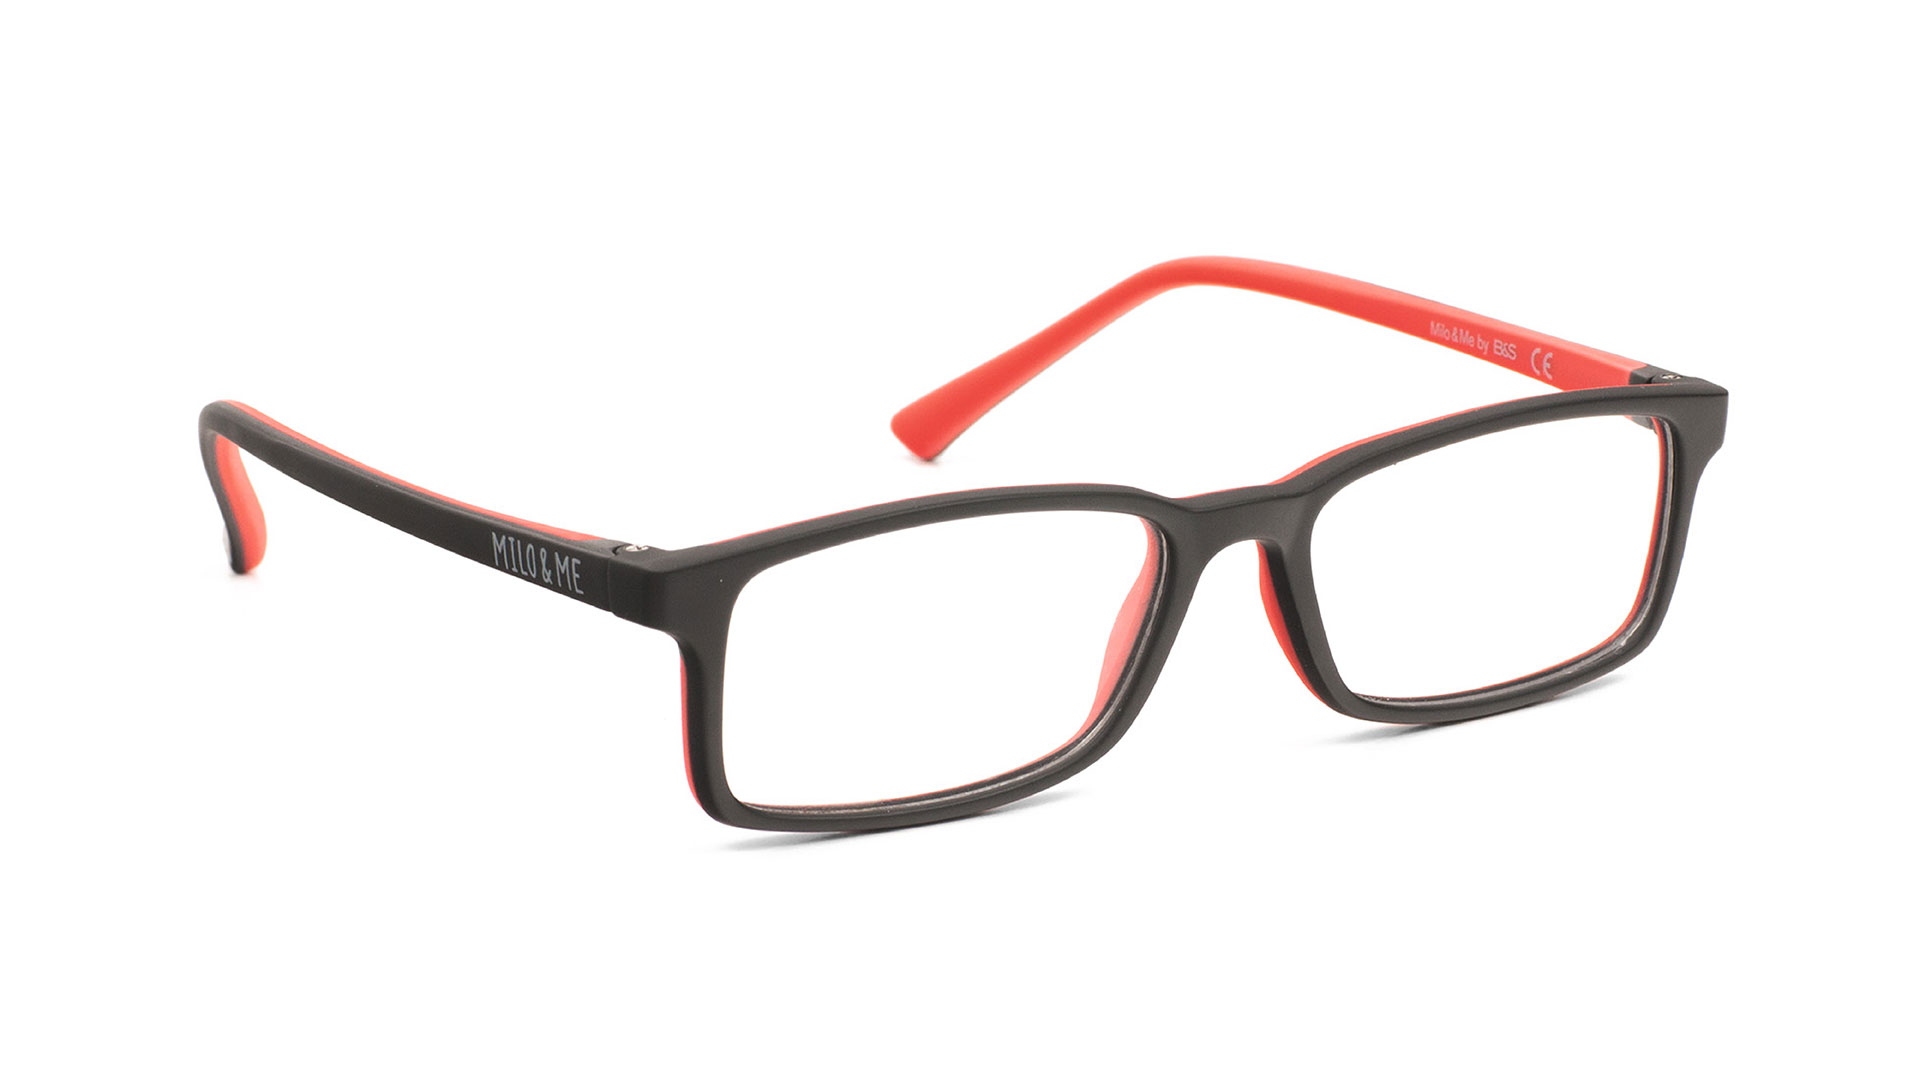 BlackRed H85021-13 - Milo & Me Eyewear - Optimum RX Lens Specialists